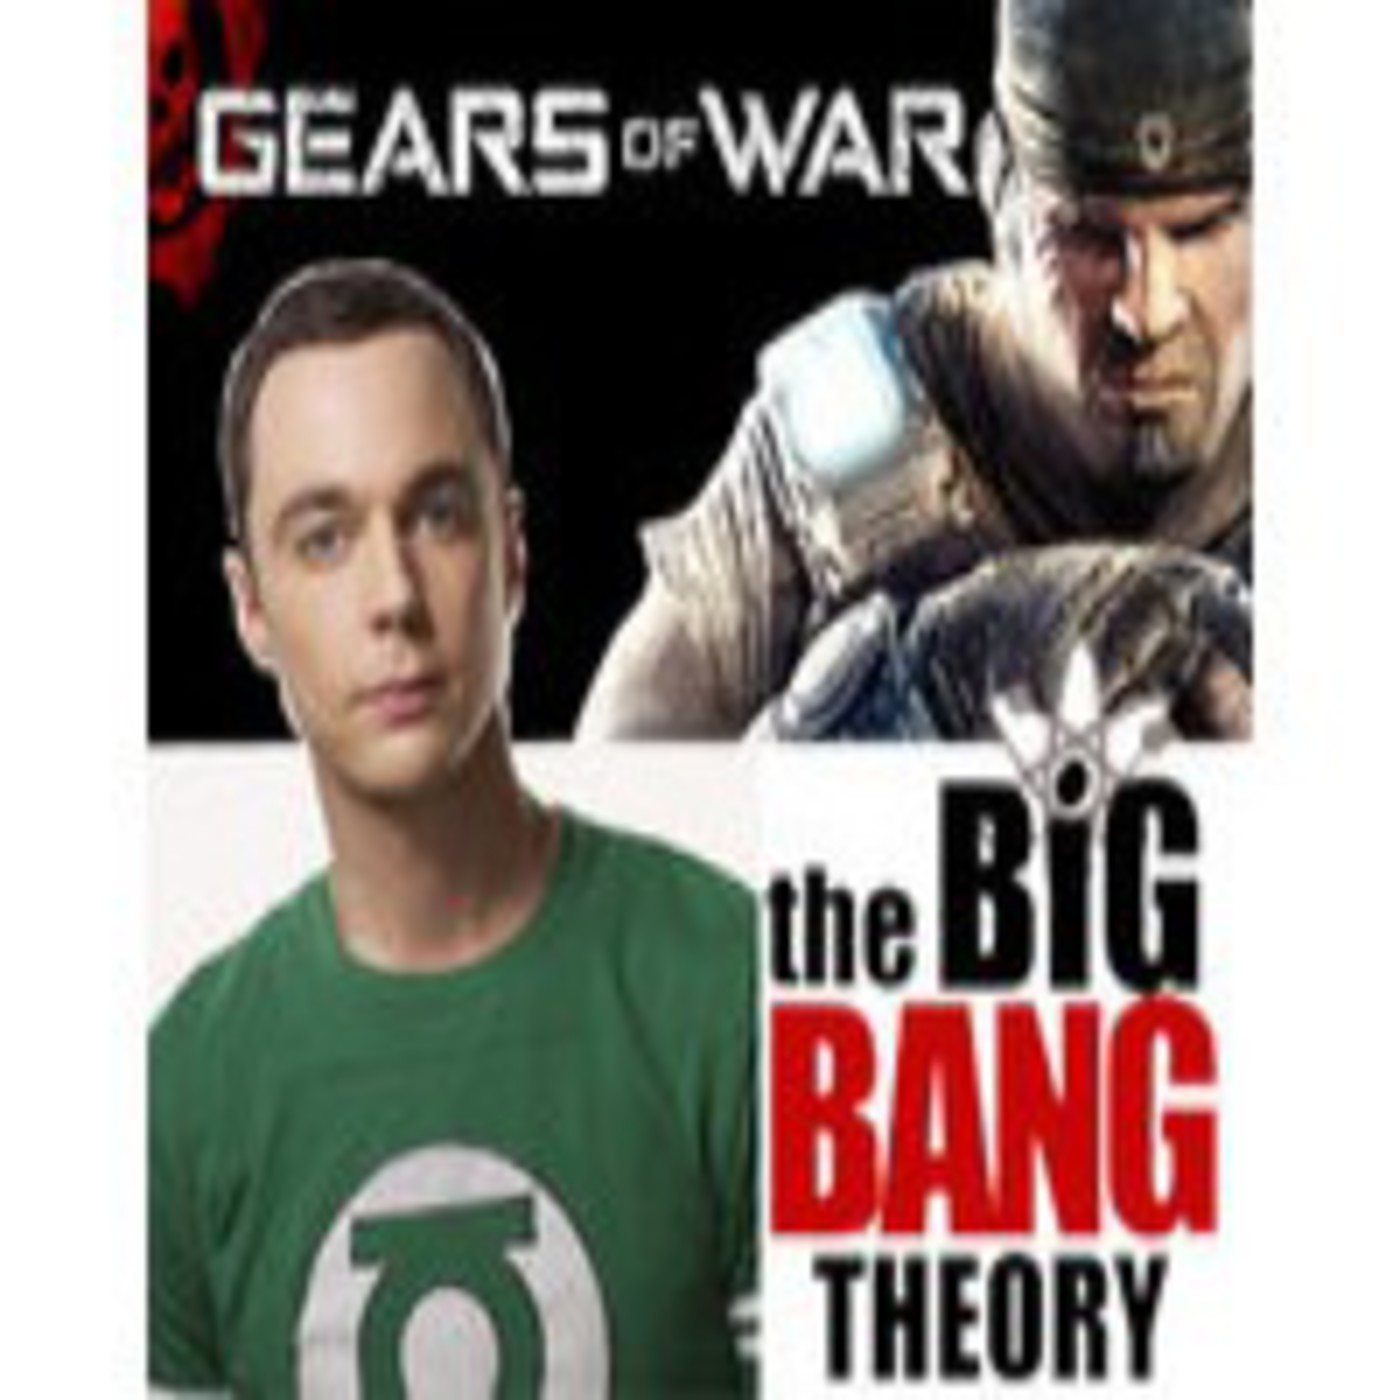 LODE 2x05 The BIG BANG THEORY la serie + GEARS OF WAR toda la saga